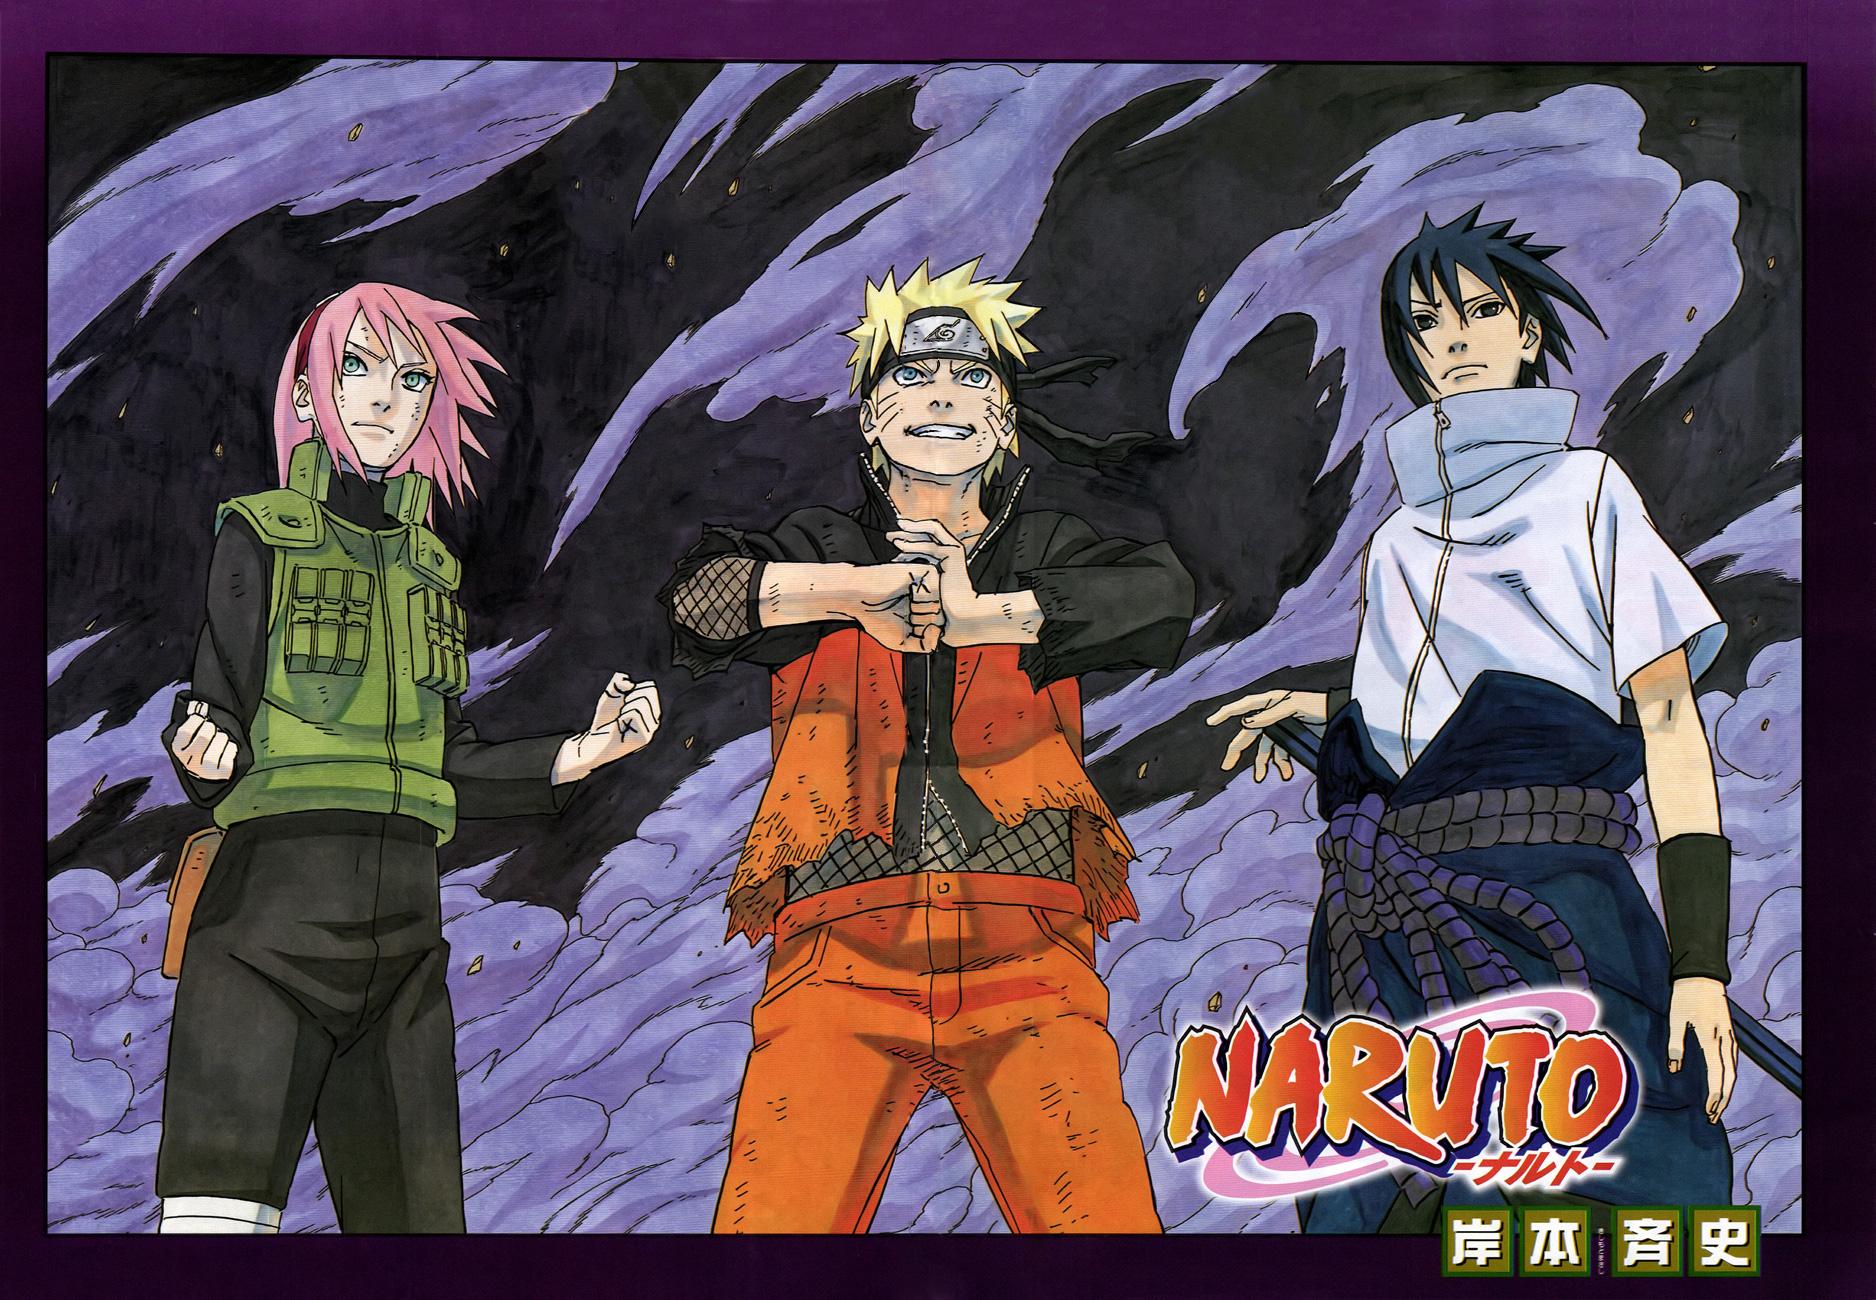 Uncategorized Naruto Manga Color Pages naruto image 1510366 zerochan anime board view fullsize image